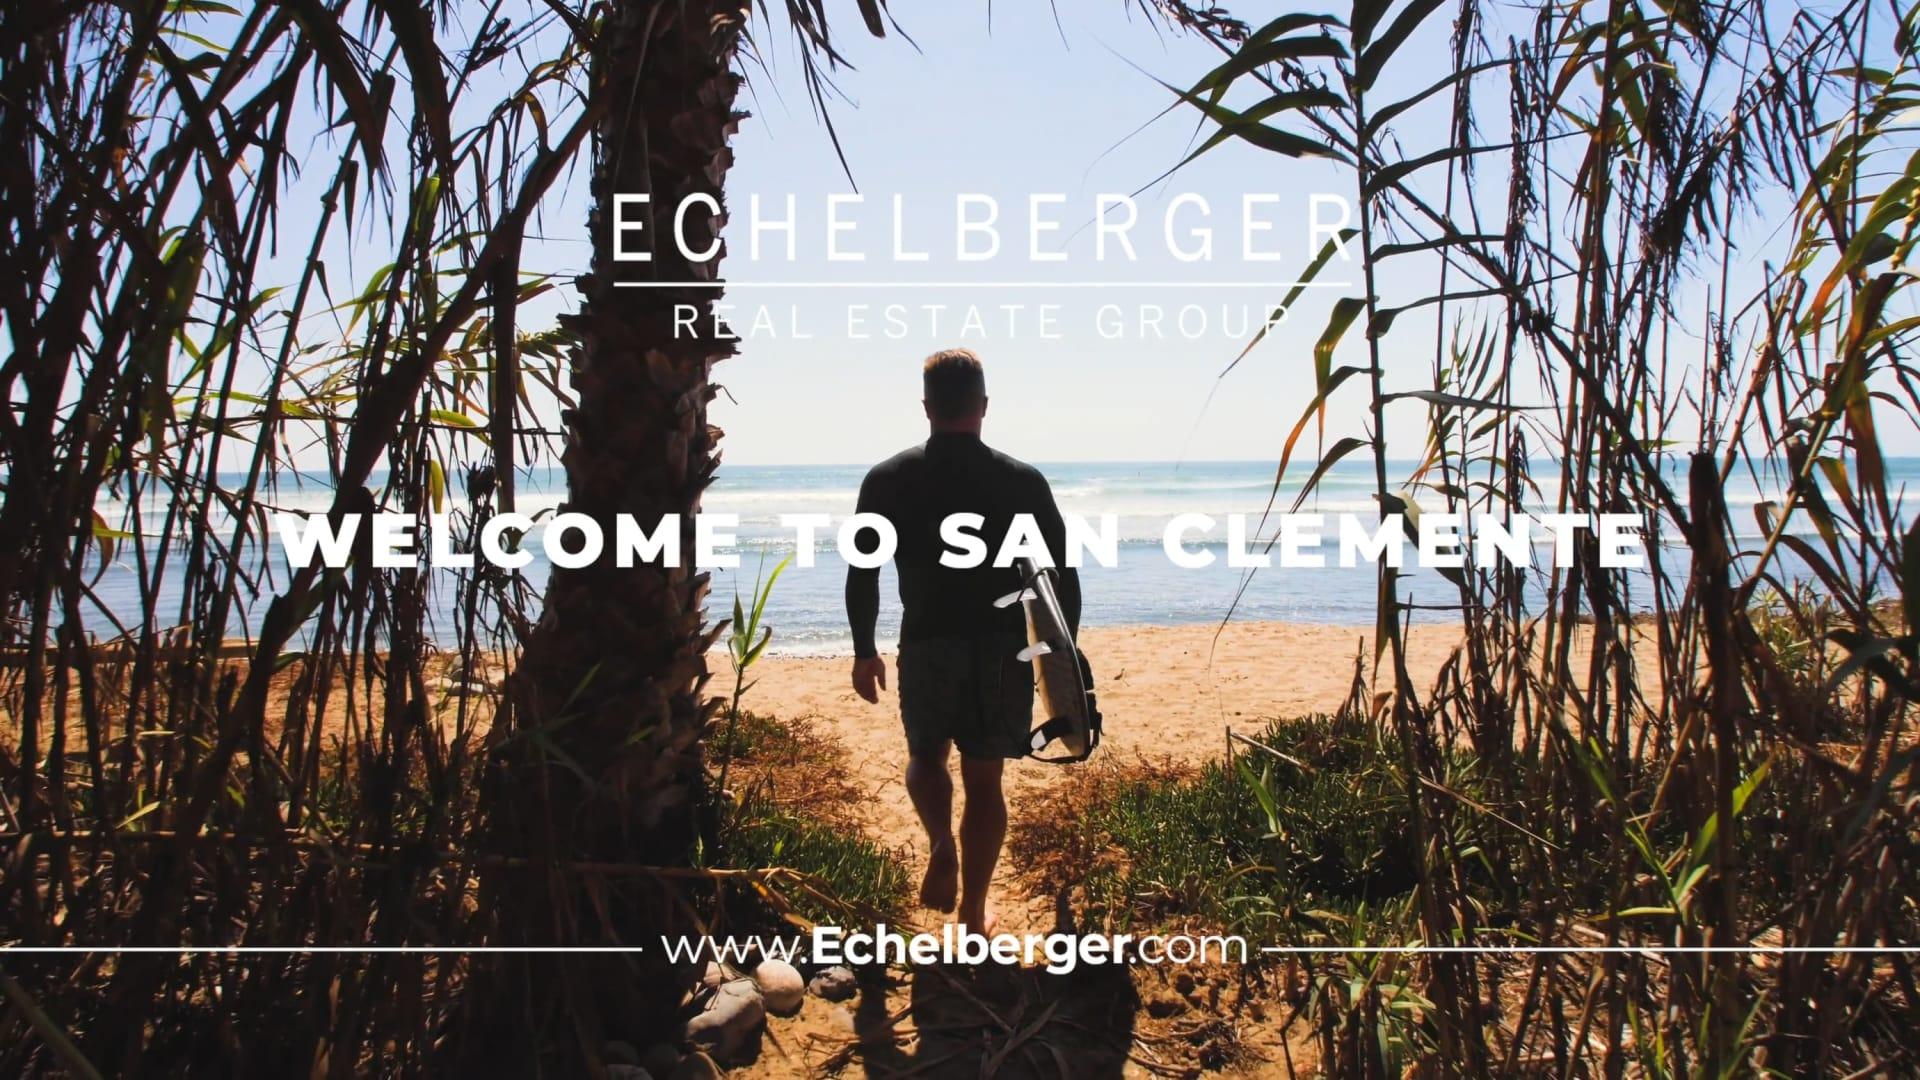 San Clemente video preview